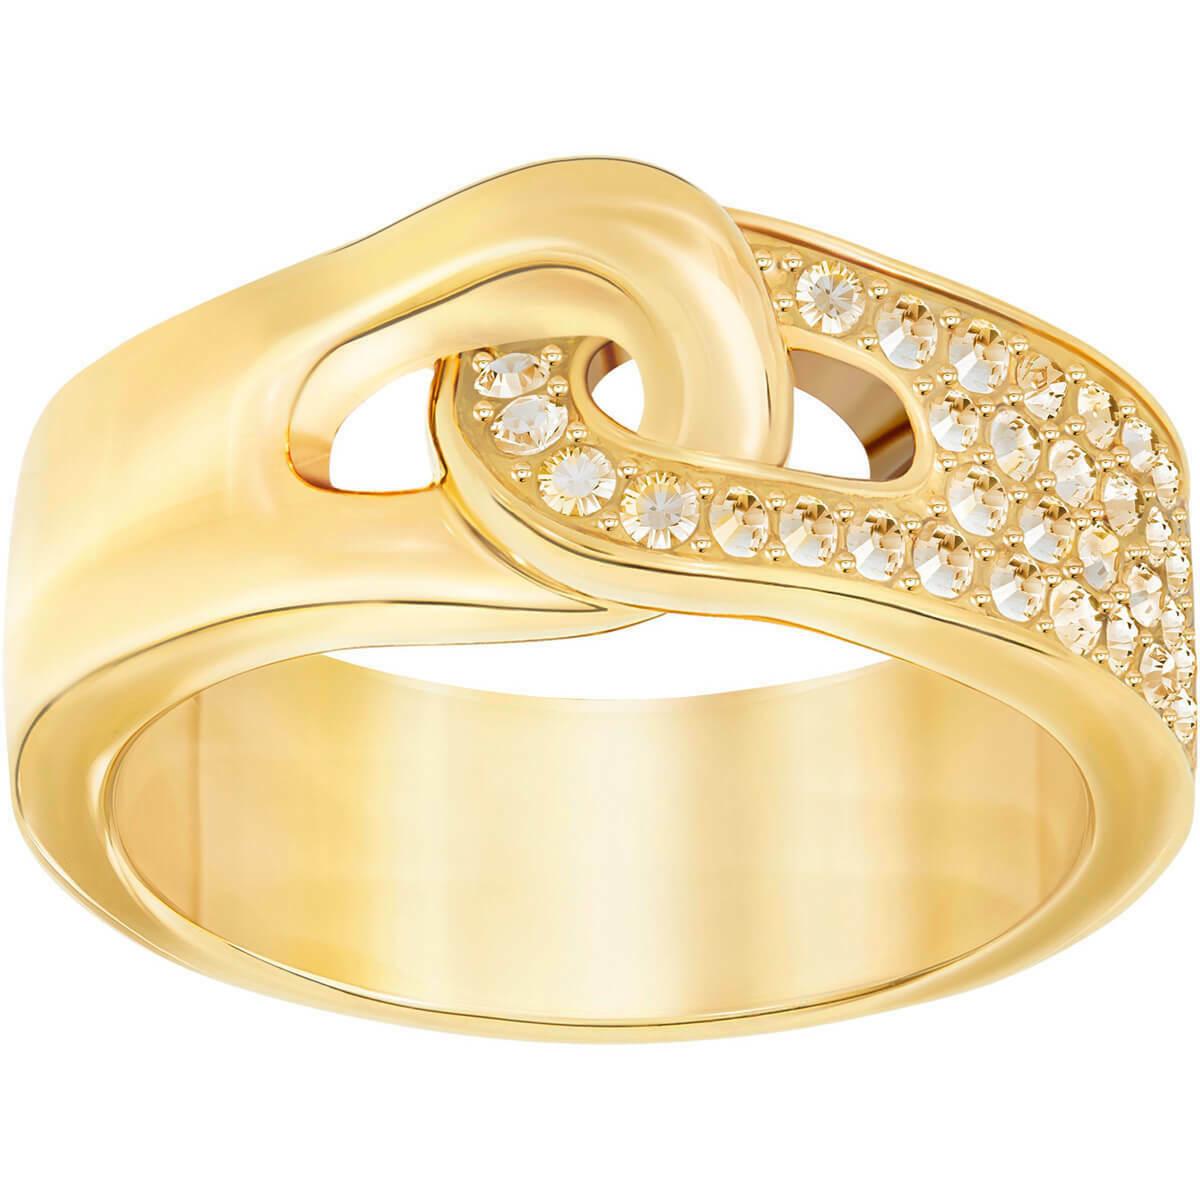 Authentic Swarovski Gallon Yellow Gold Ring - RRP $99